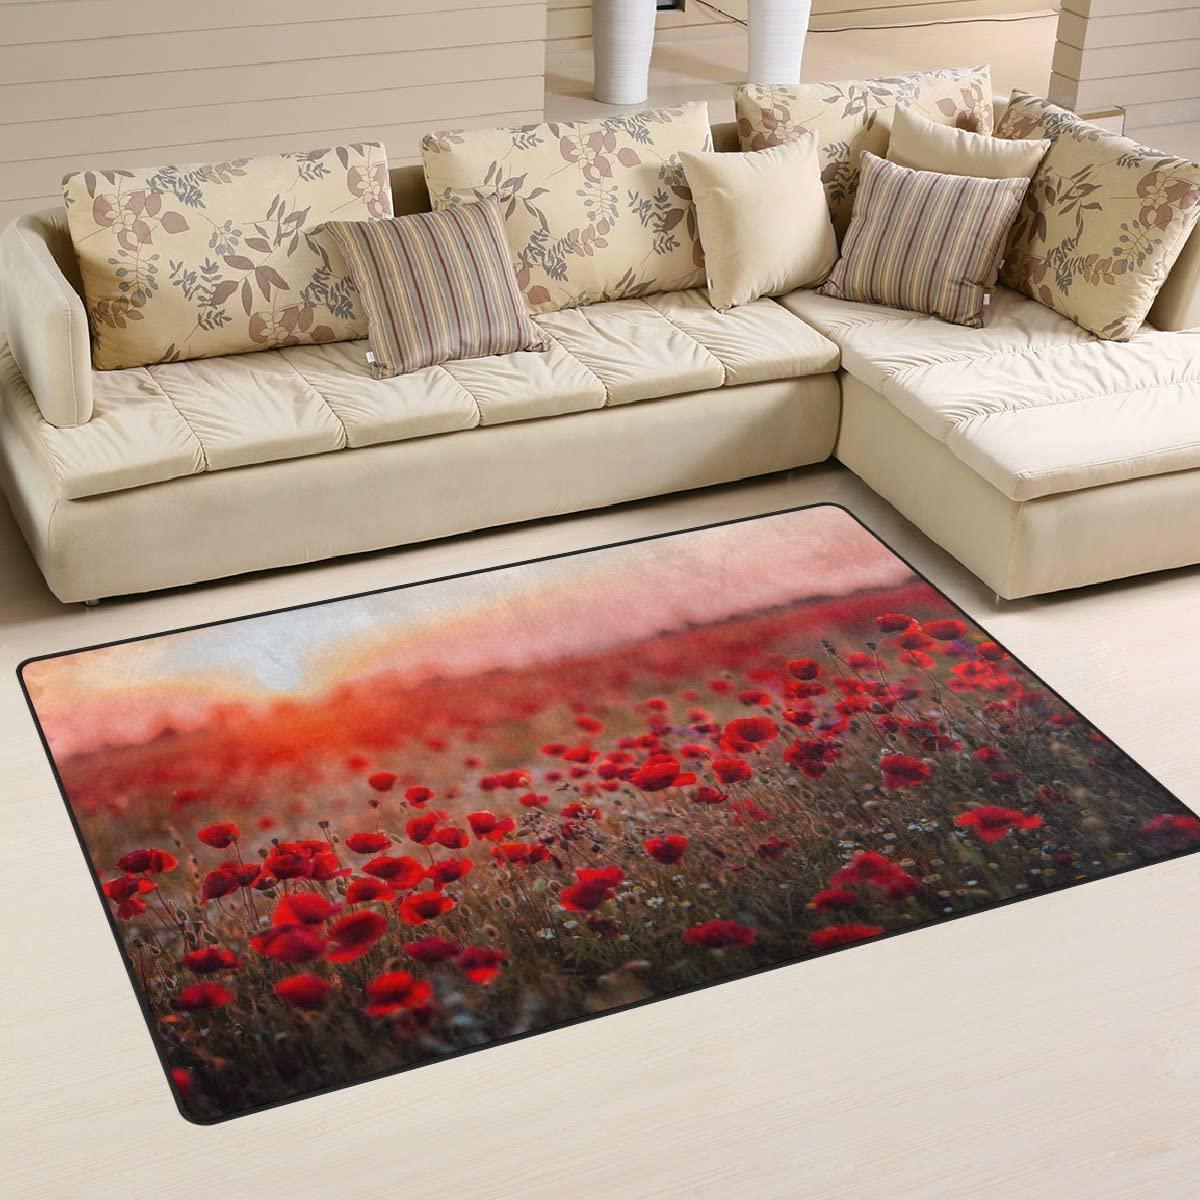 WellLee Area Rug,Colorful Wild Flower Field Red Poppies Sunset Floor Rug Non-Slip Doormat for Living Dining Dorm Room Bedroom Decor 60x39 Inch